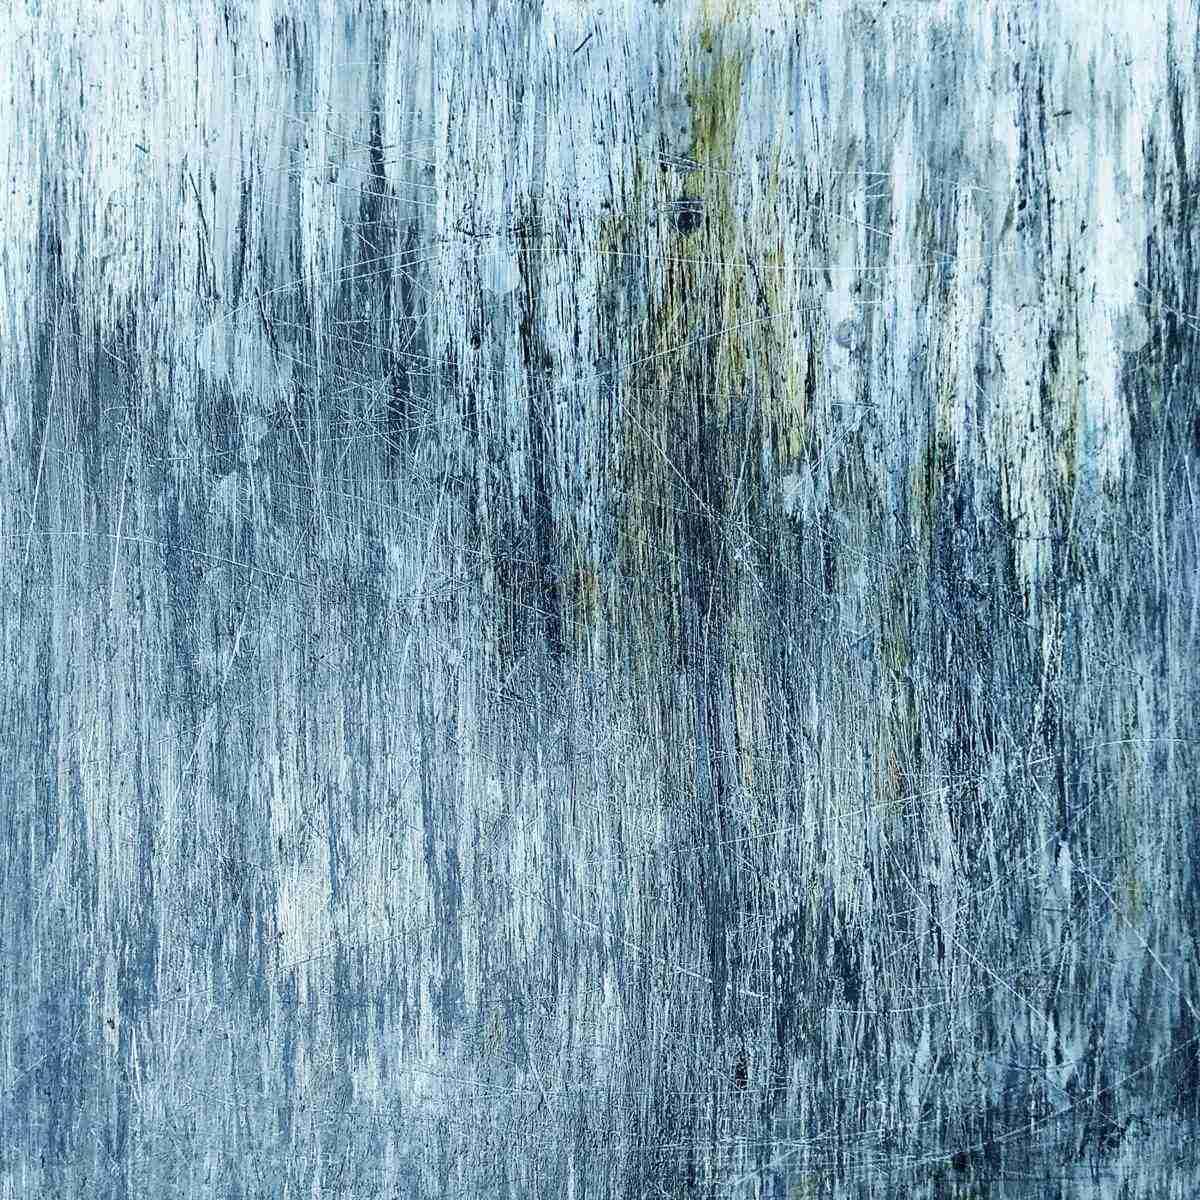 daniel-schuh-restlessness-web